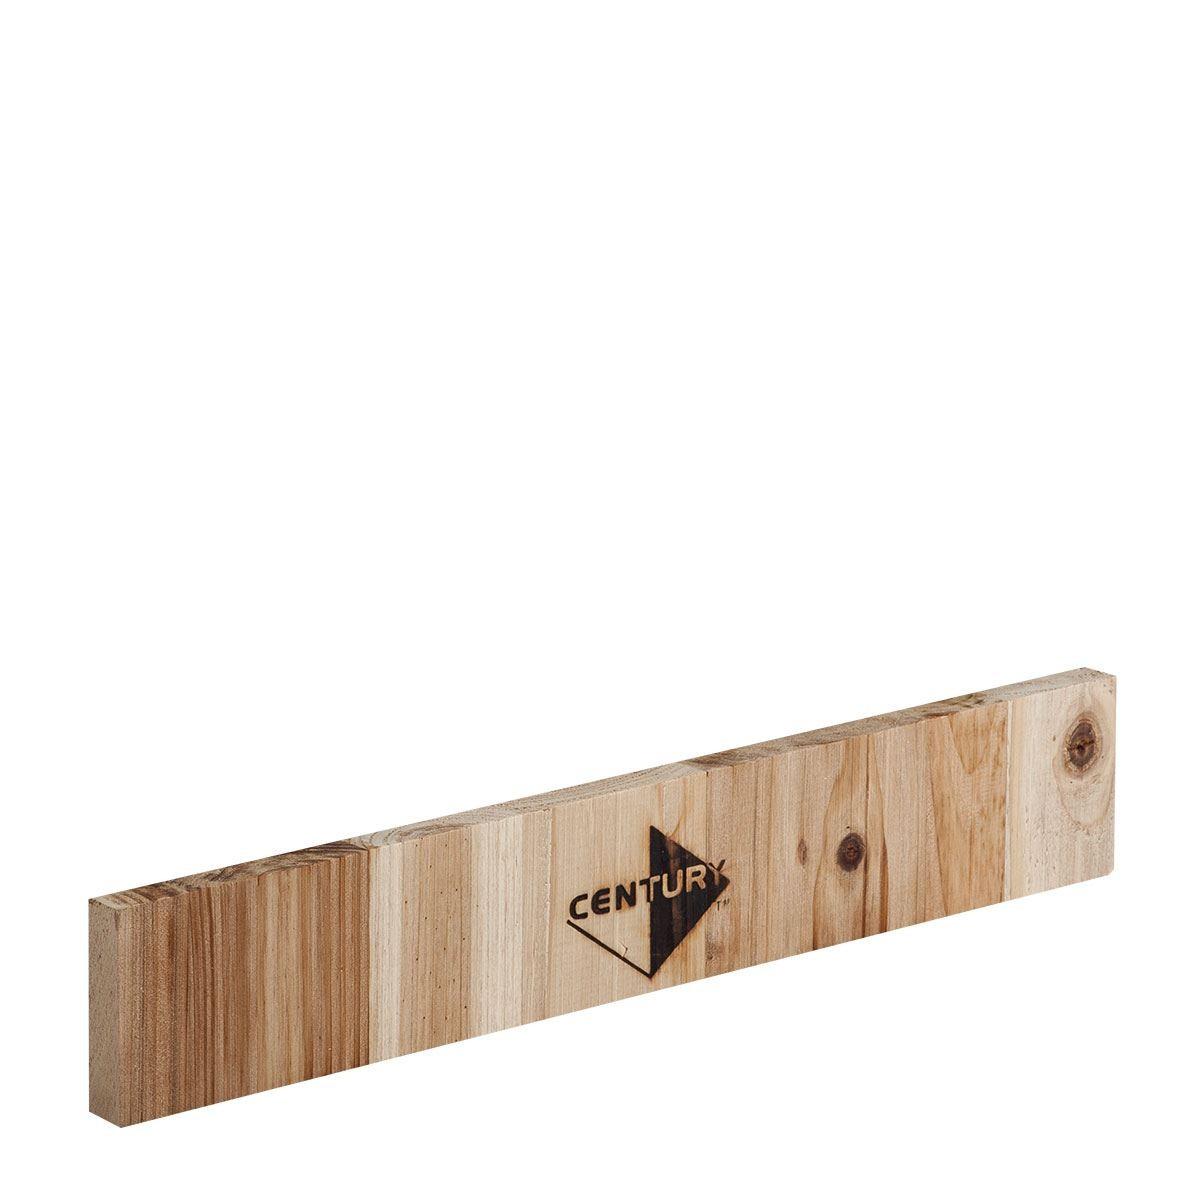 "Century Martial Arts Pine Break Boards - 2"" X 12"" X 0.5"""